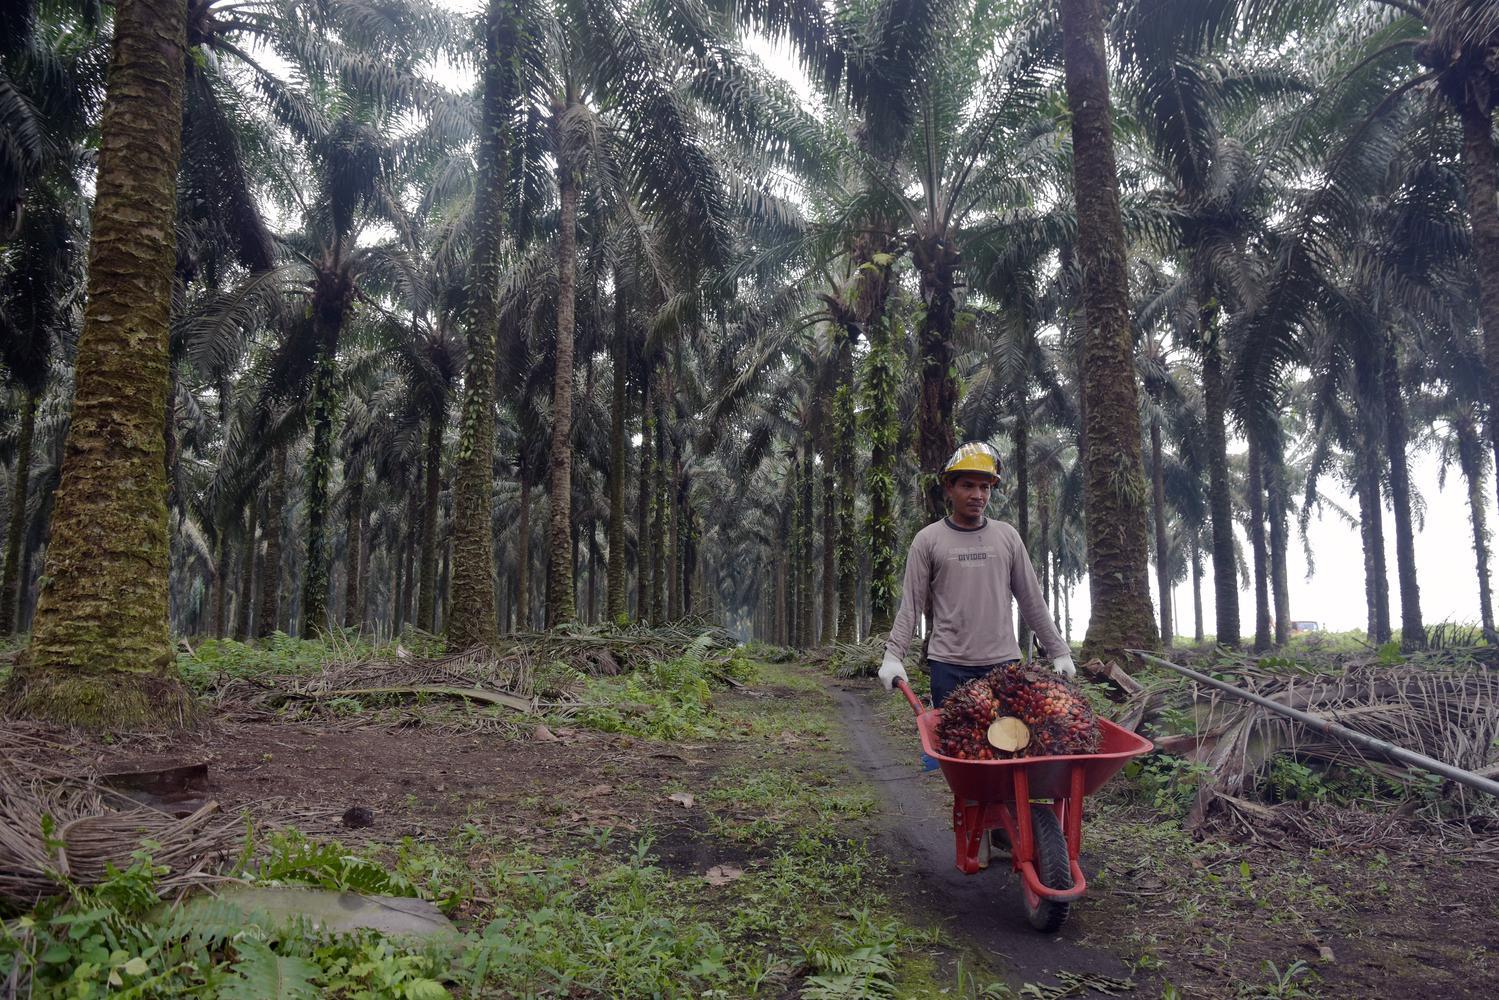 Lantik Direksi Baru, Sri Mulyani Minta BPDPKS Fokus Replanting Sawit.